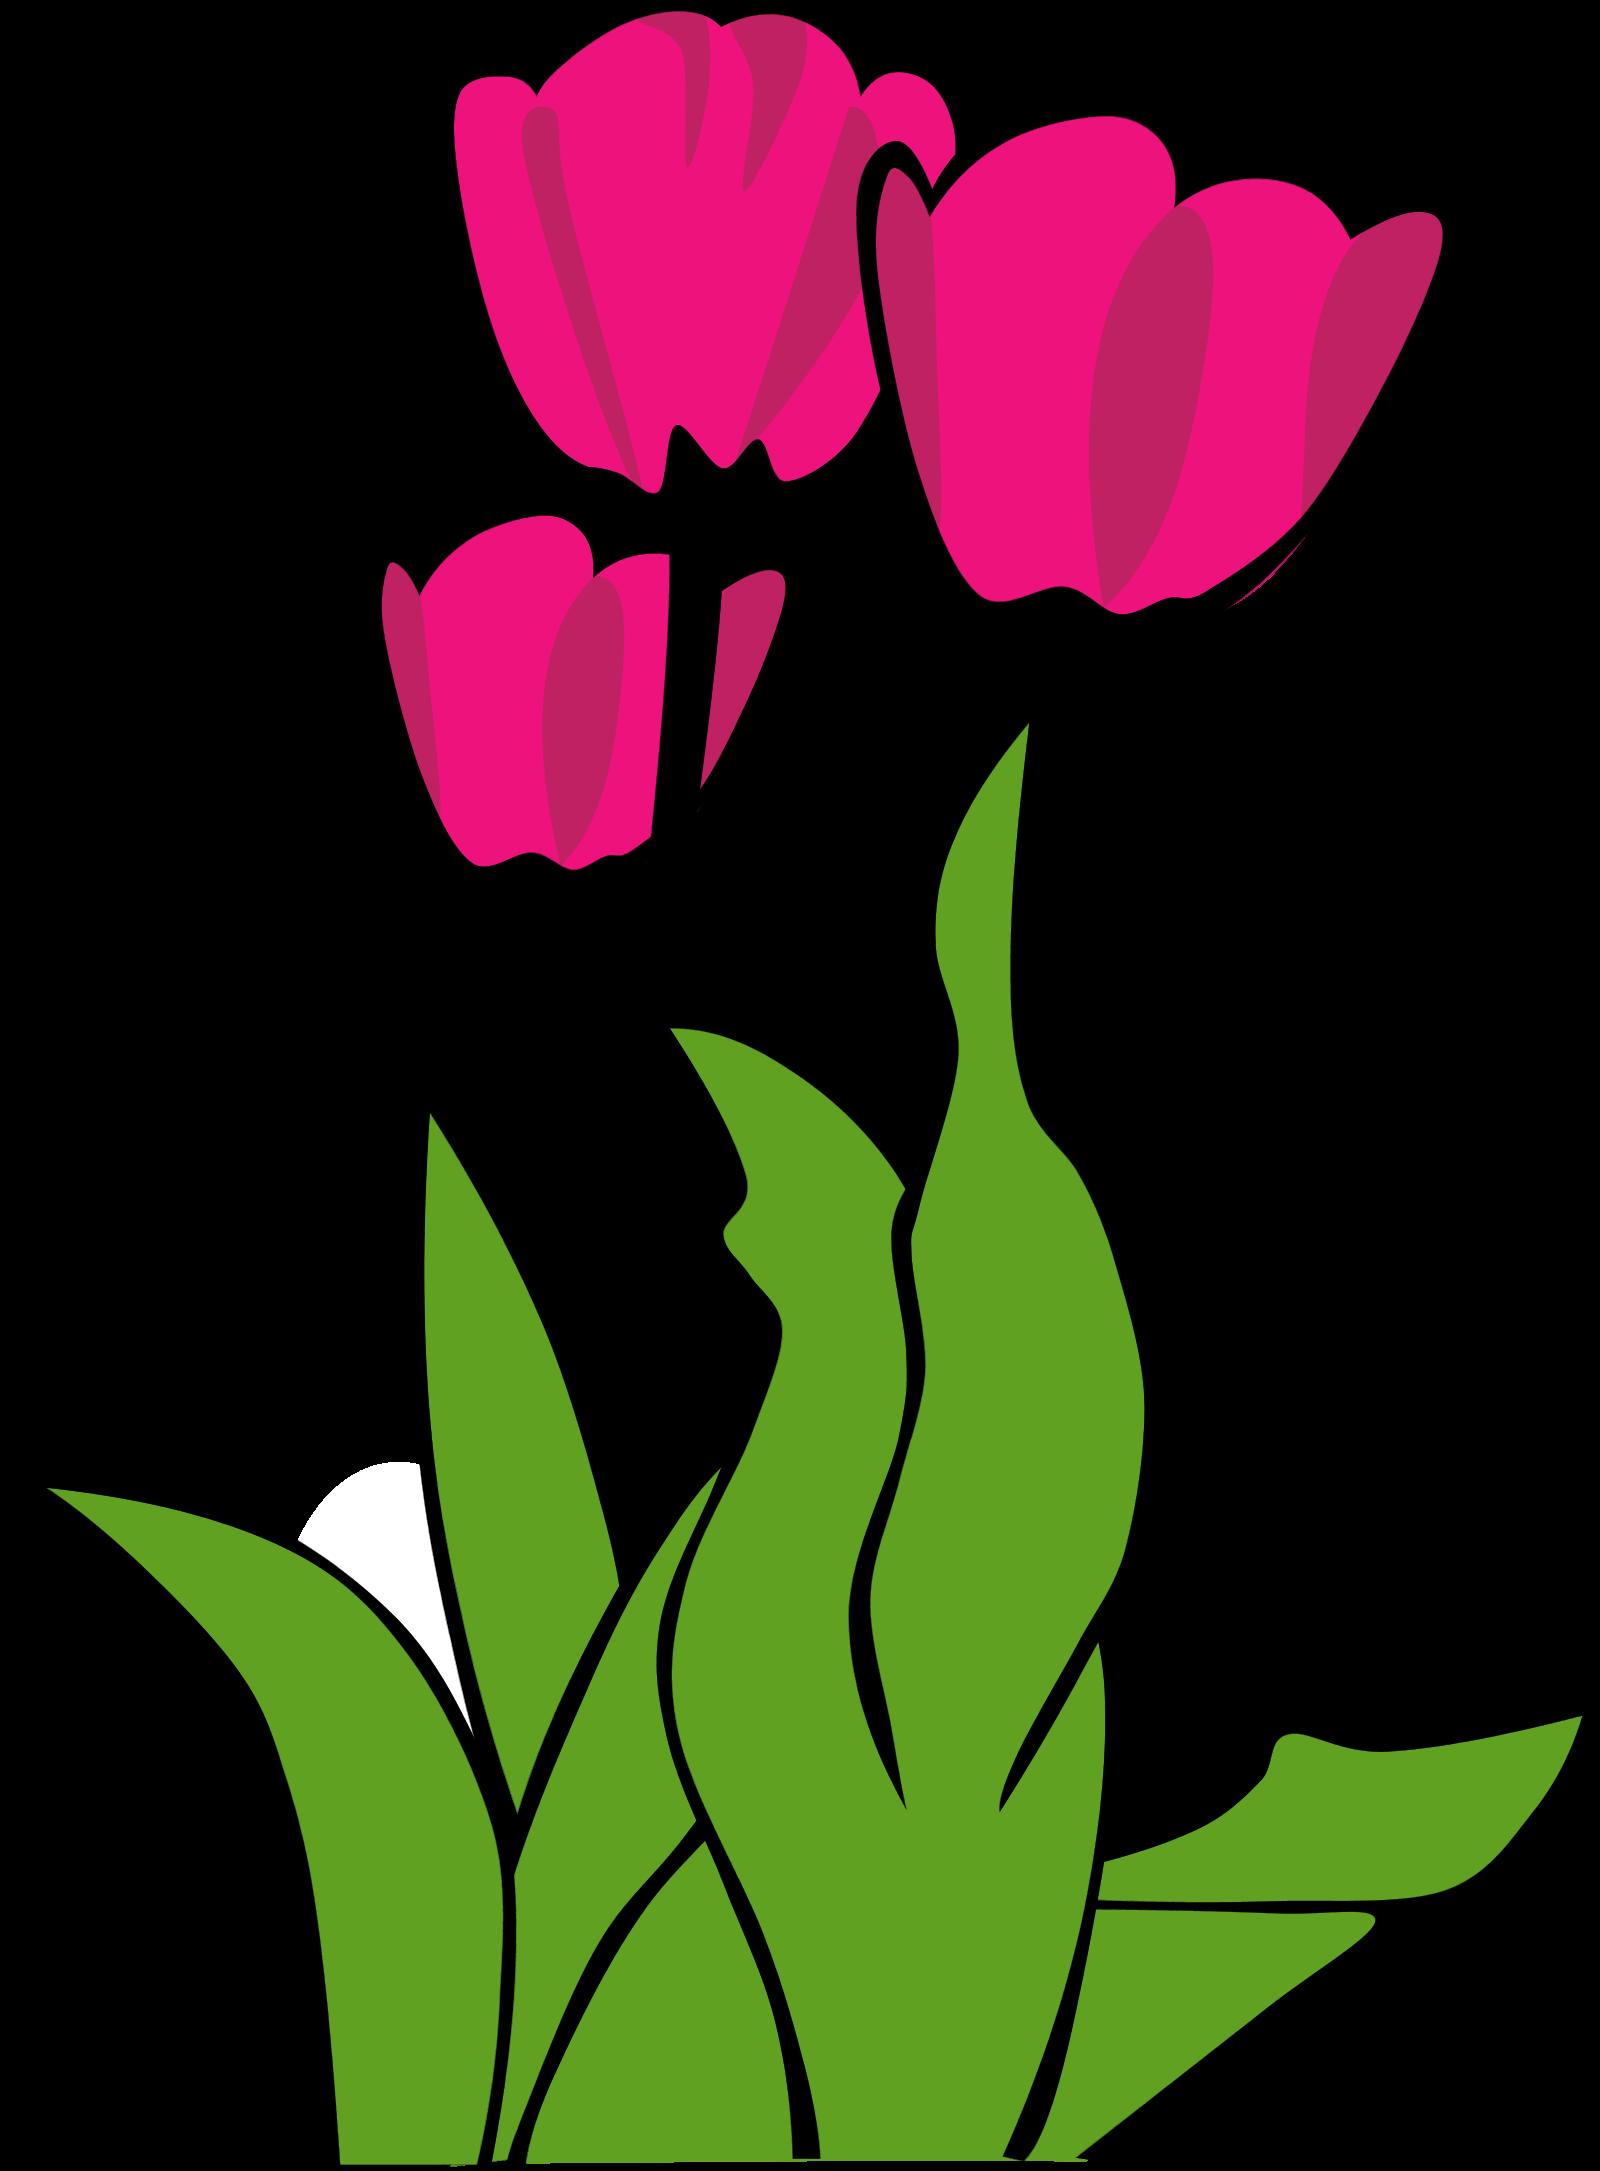 Tulip Clip Art Free   Clipart Panda - Free Clipart Images